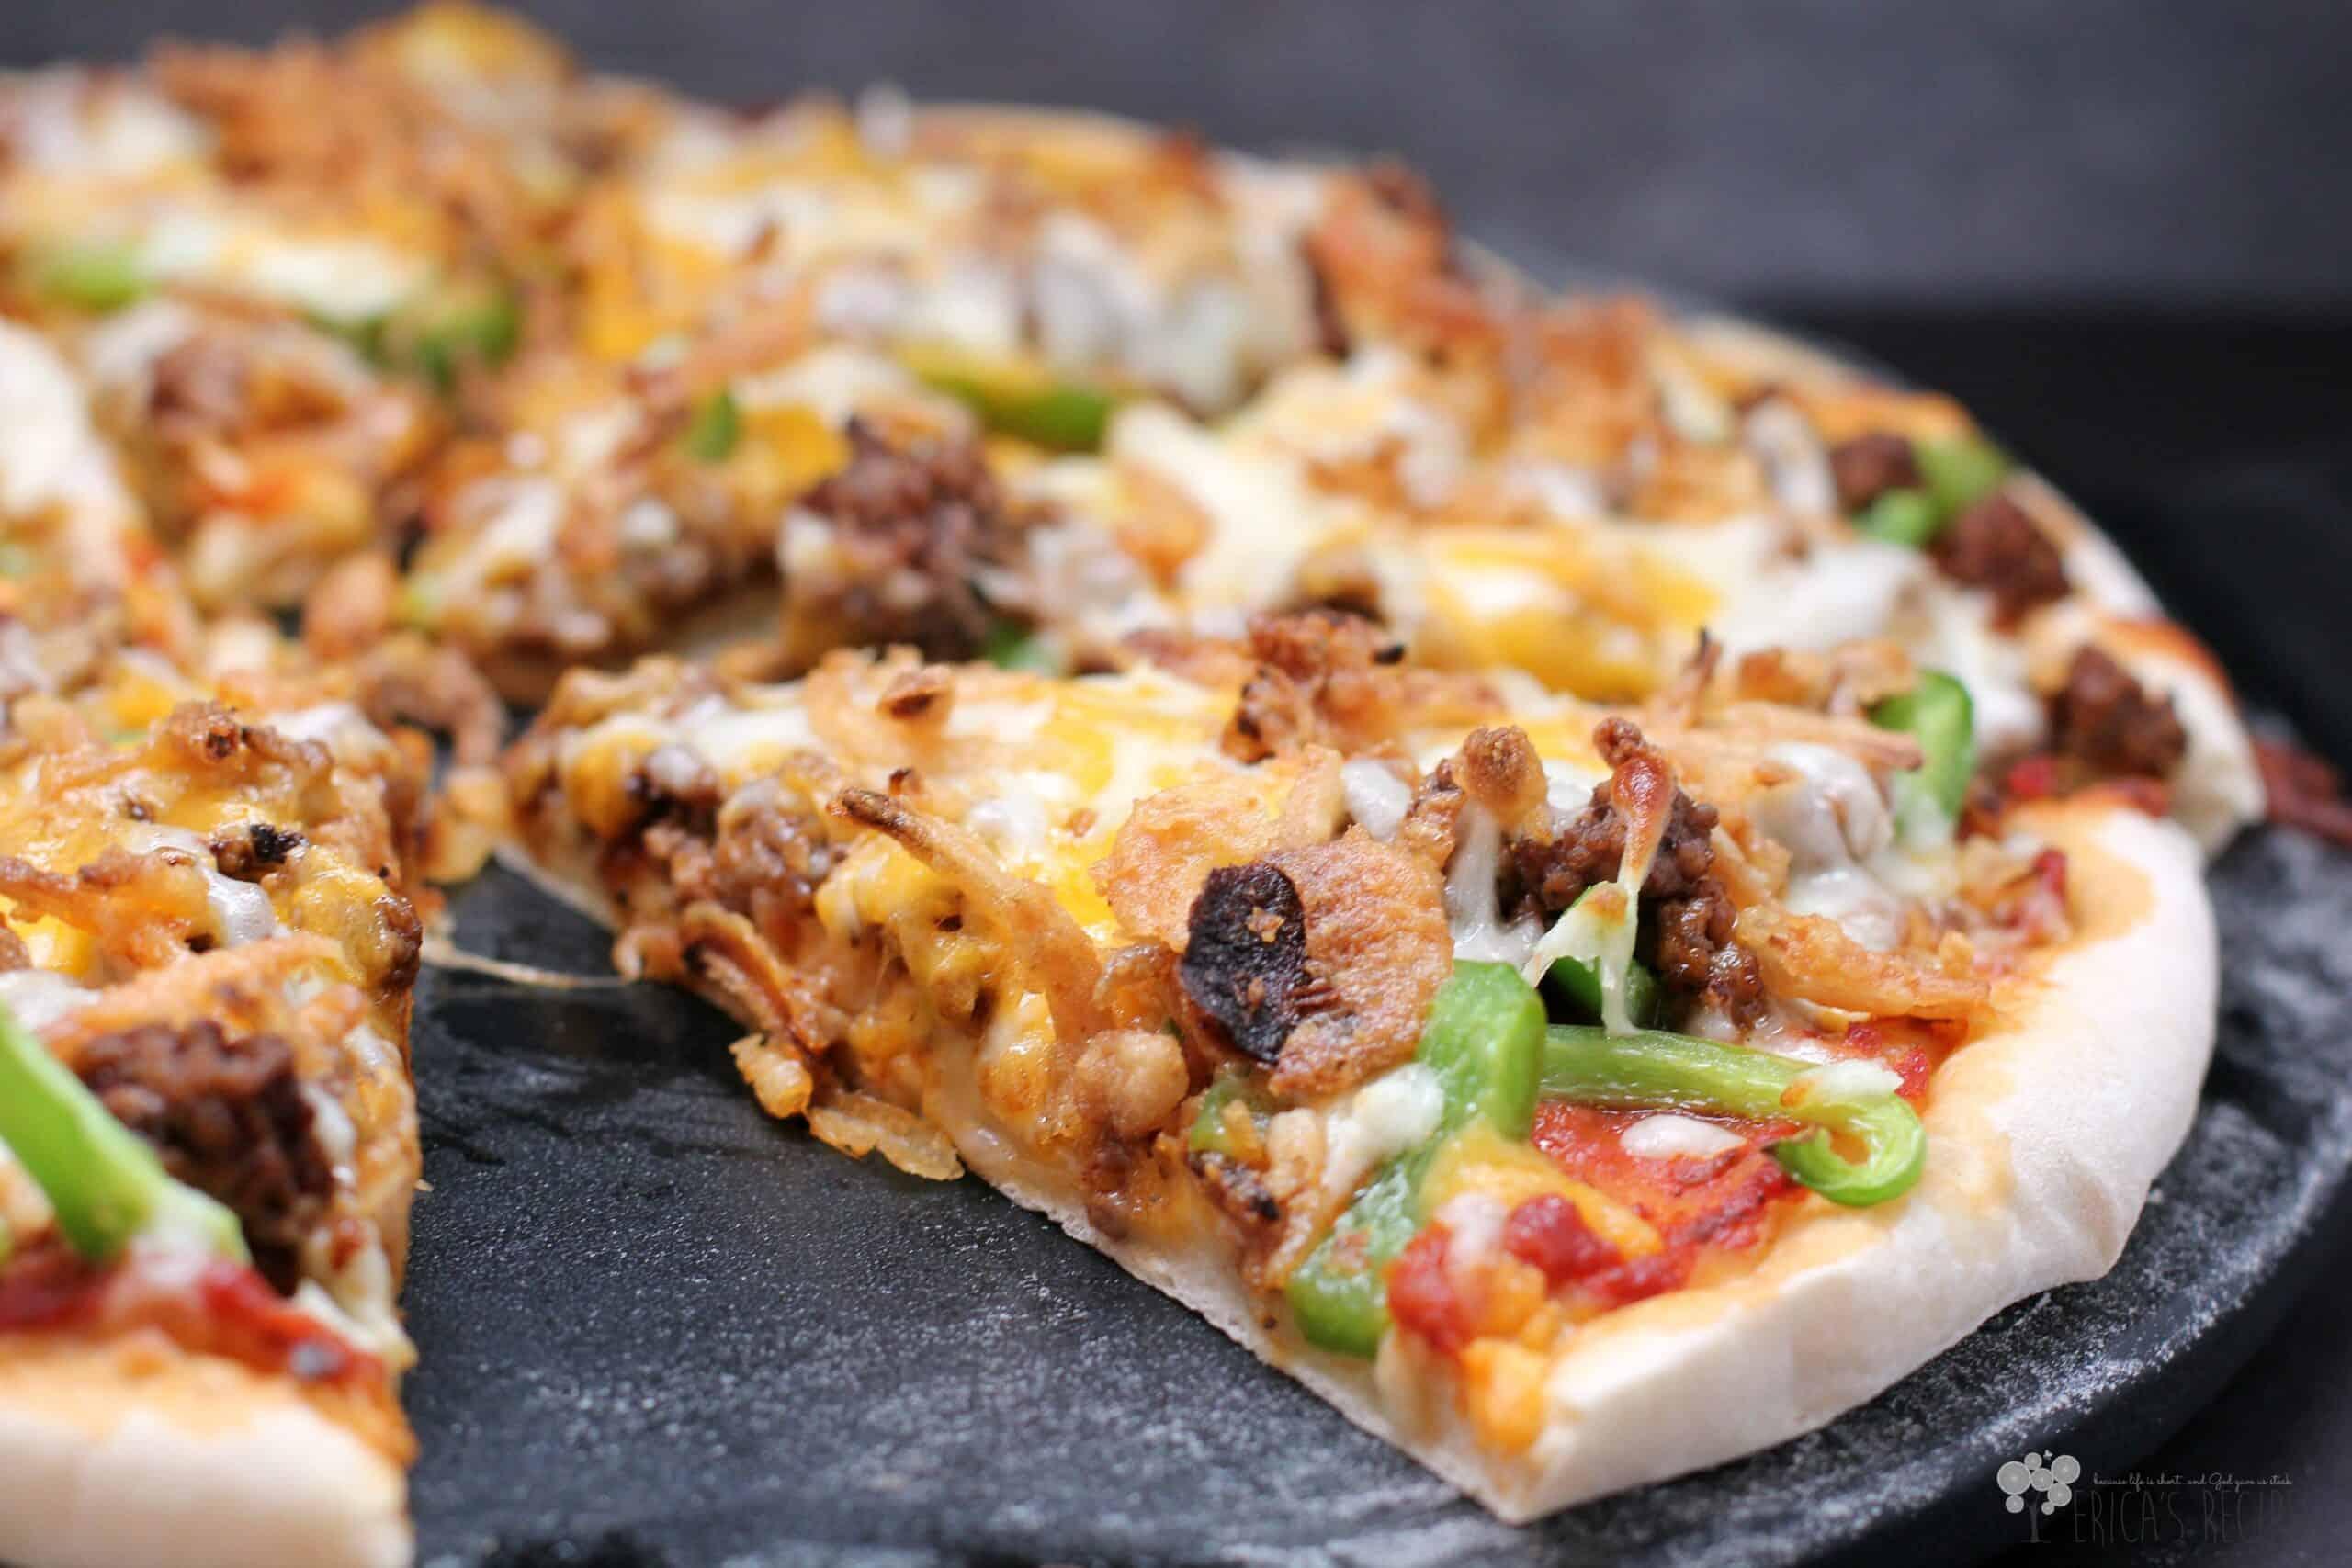 Chili Cheeseburger Pizza